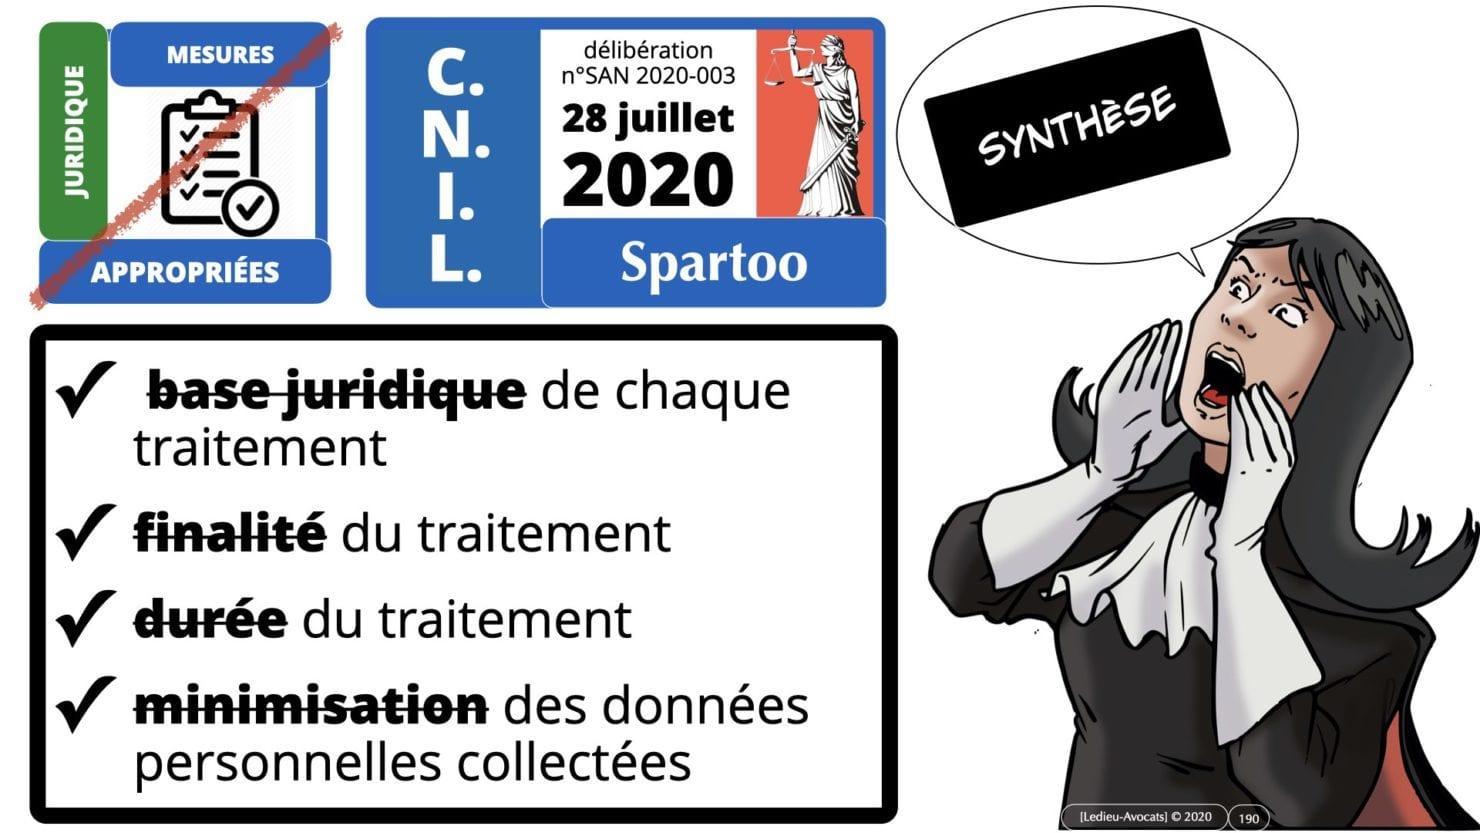 RGPD e-Privacy principes actualité jurisprudence ©Ledieu-Avocats 25-06-2021.190